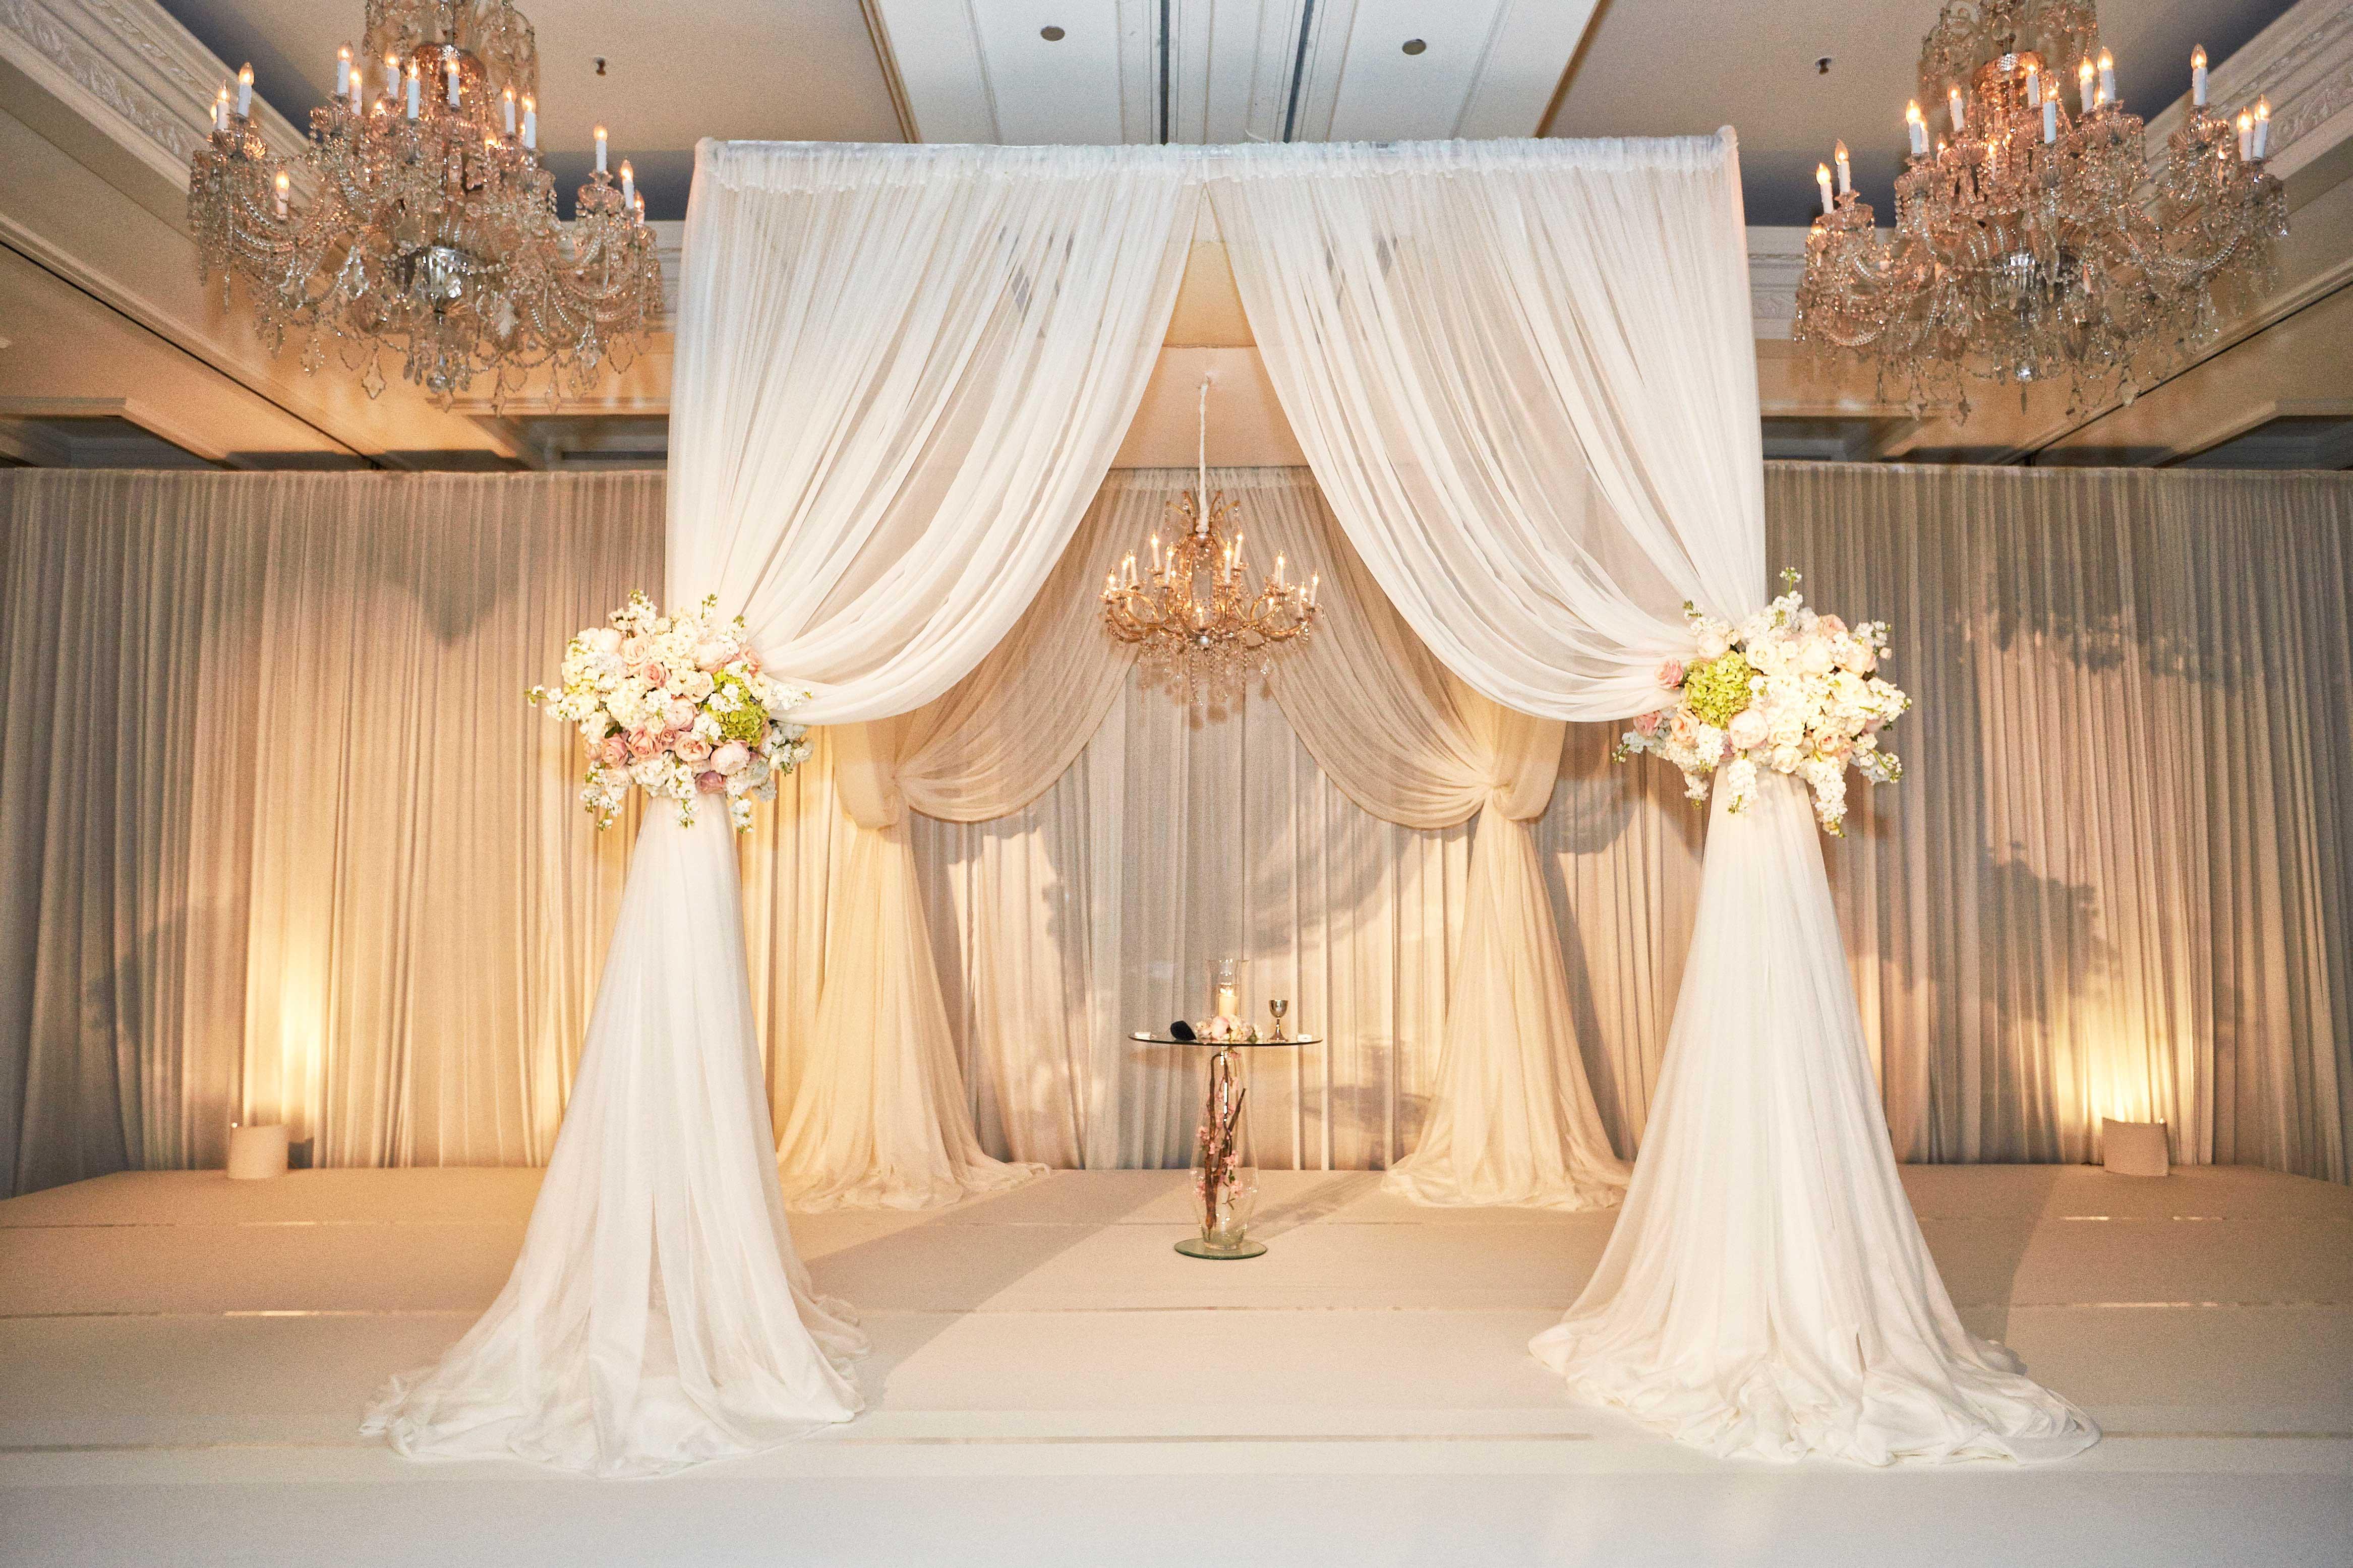 wedding chuppah altar with chandeliers